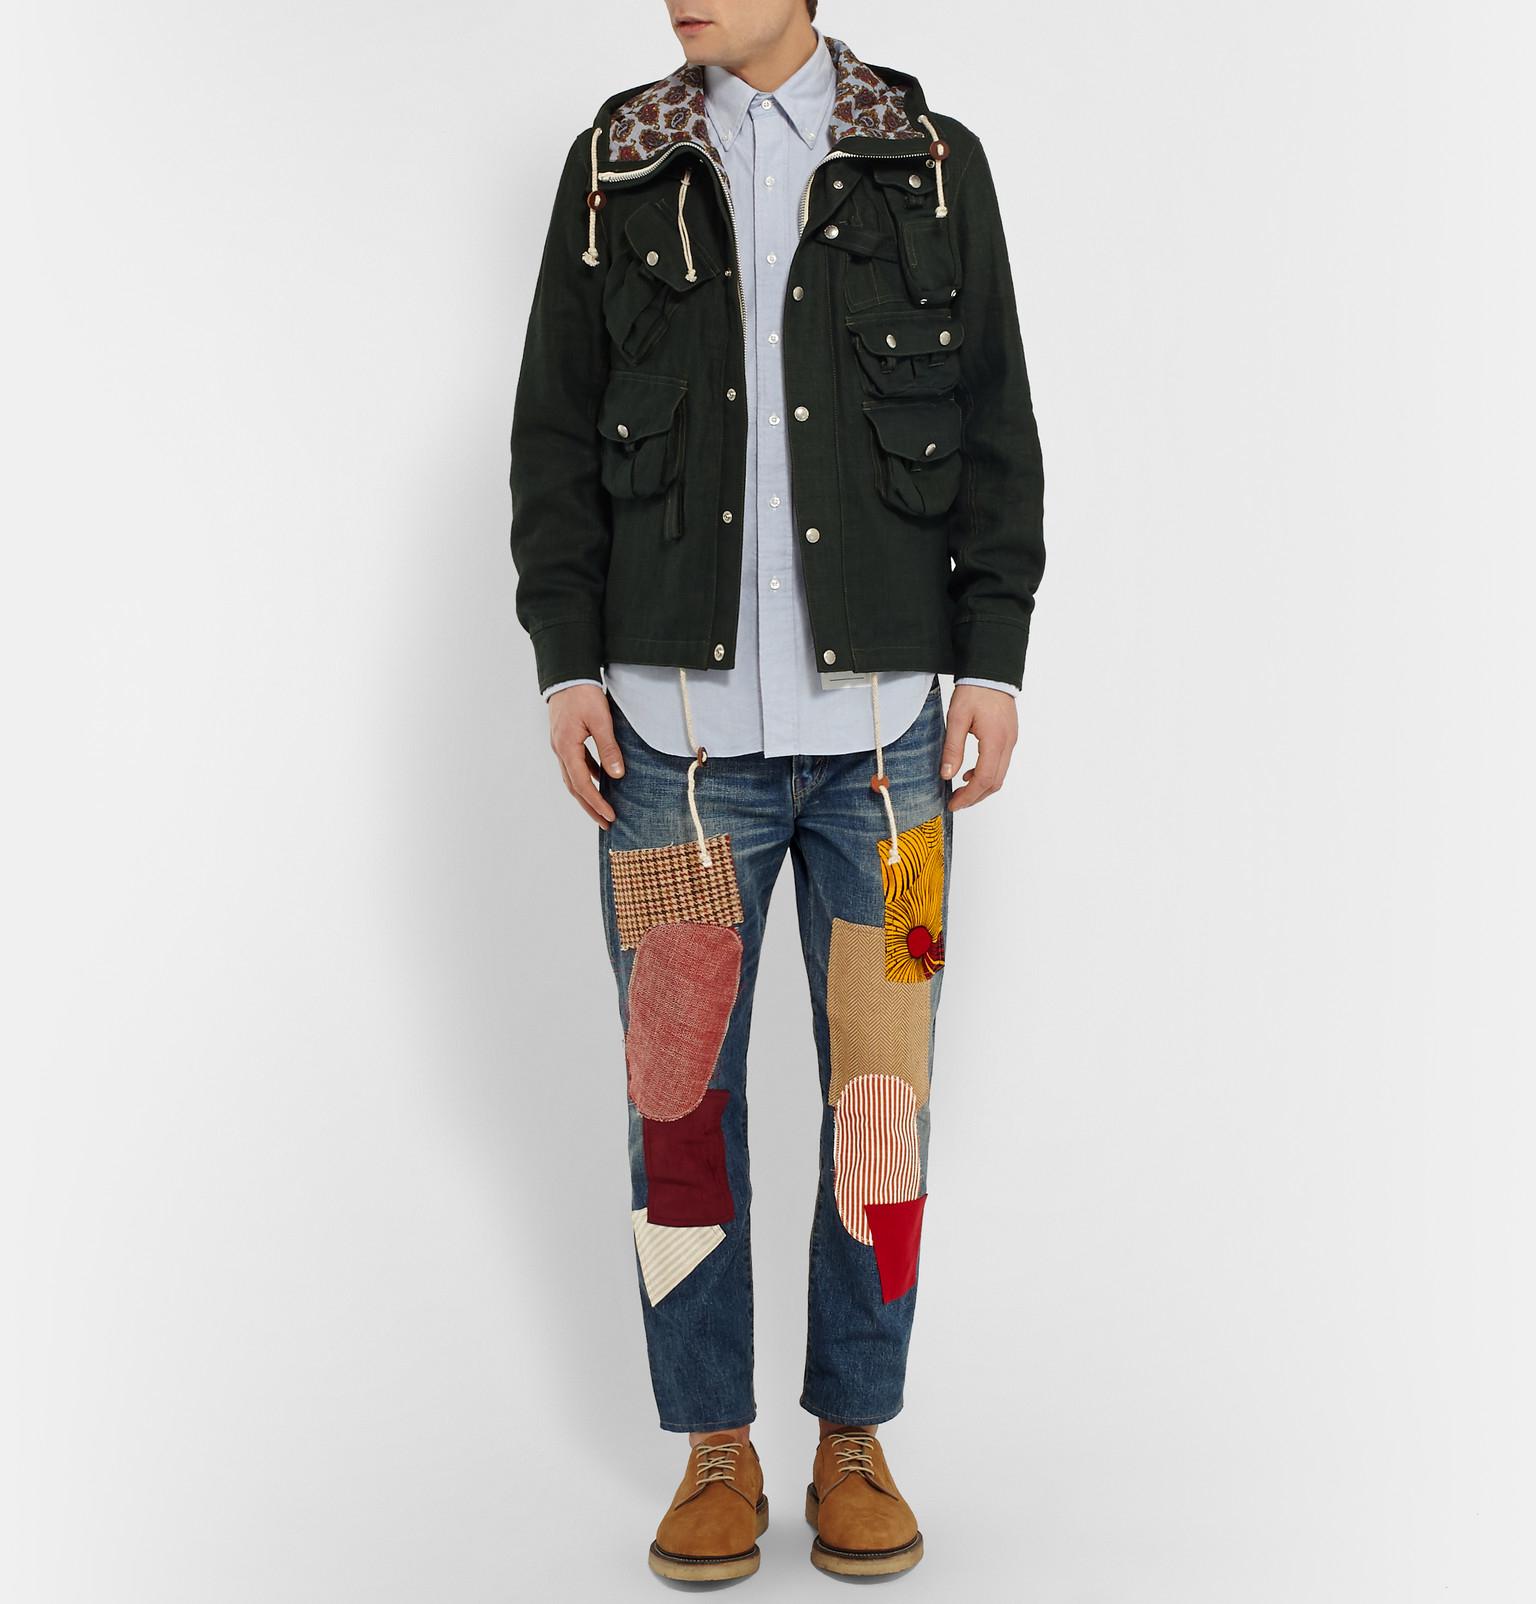 Junya Watanabe Patchwork Selvedge Denim Jeans in Indigo (Blue) for Men